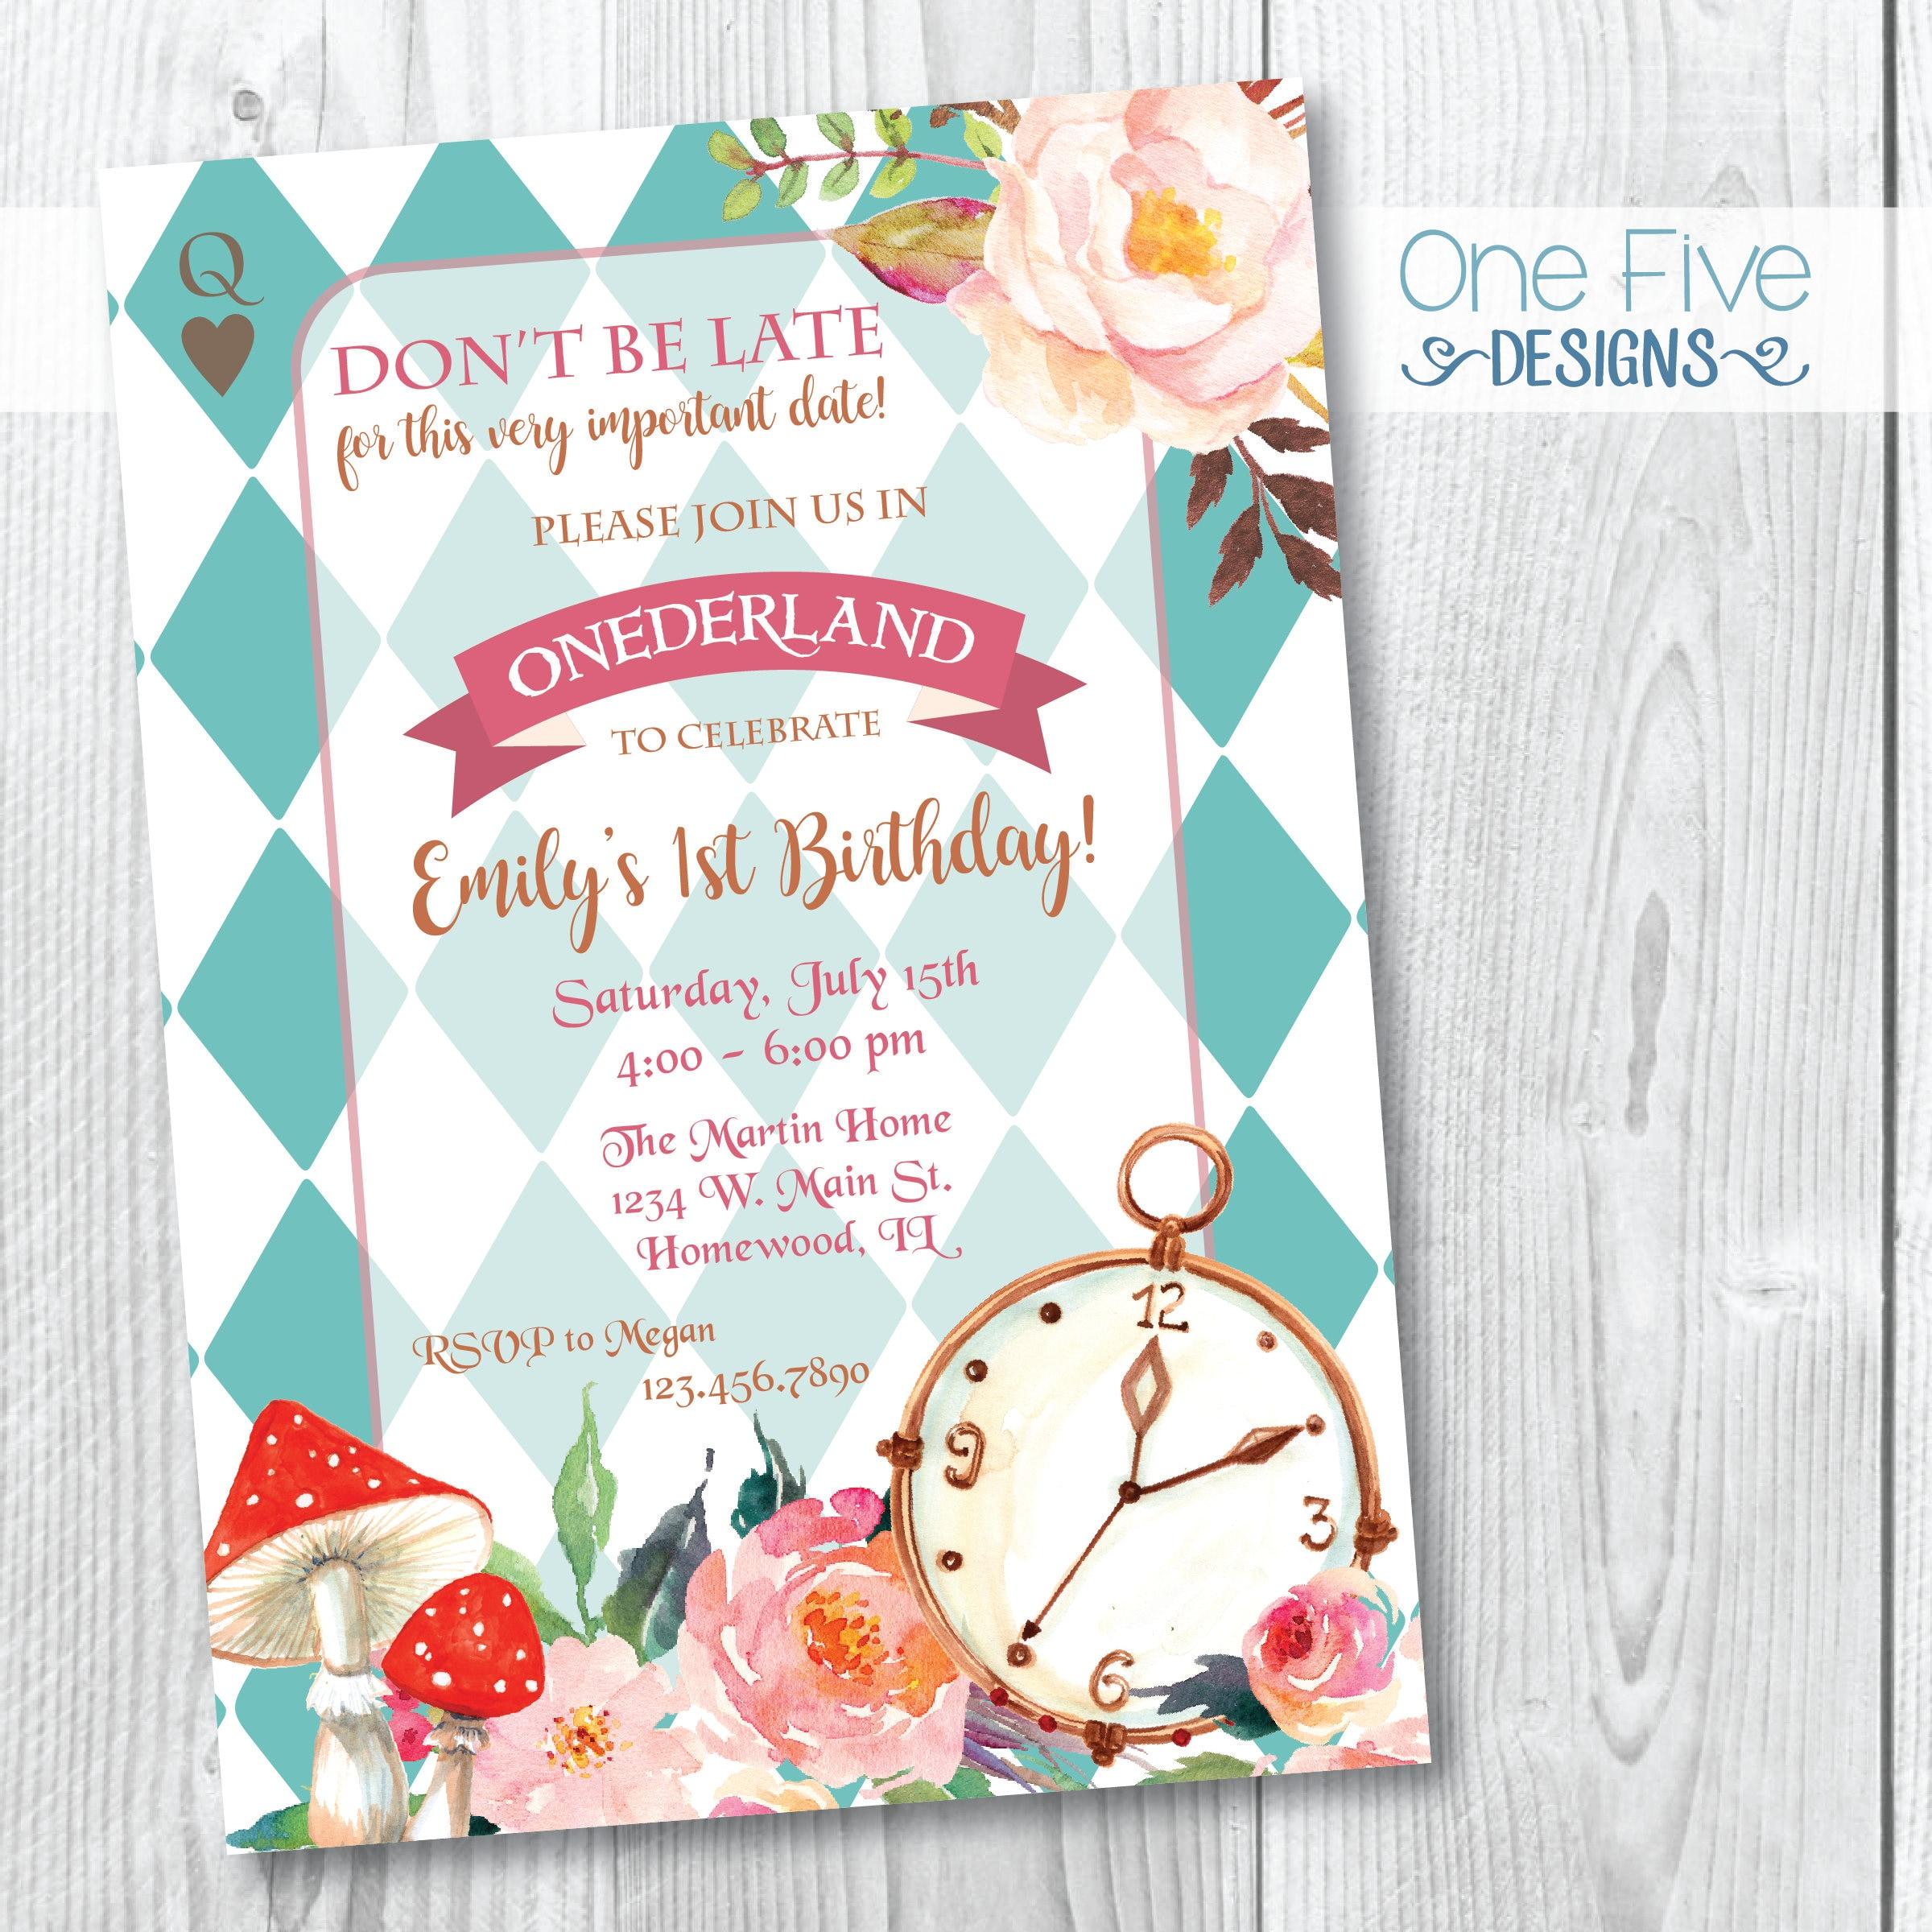 Watercolor Alice In Wonderland Birthday Party Invitation | Etsy